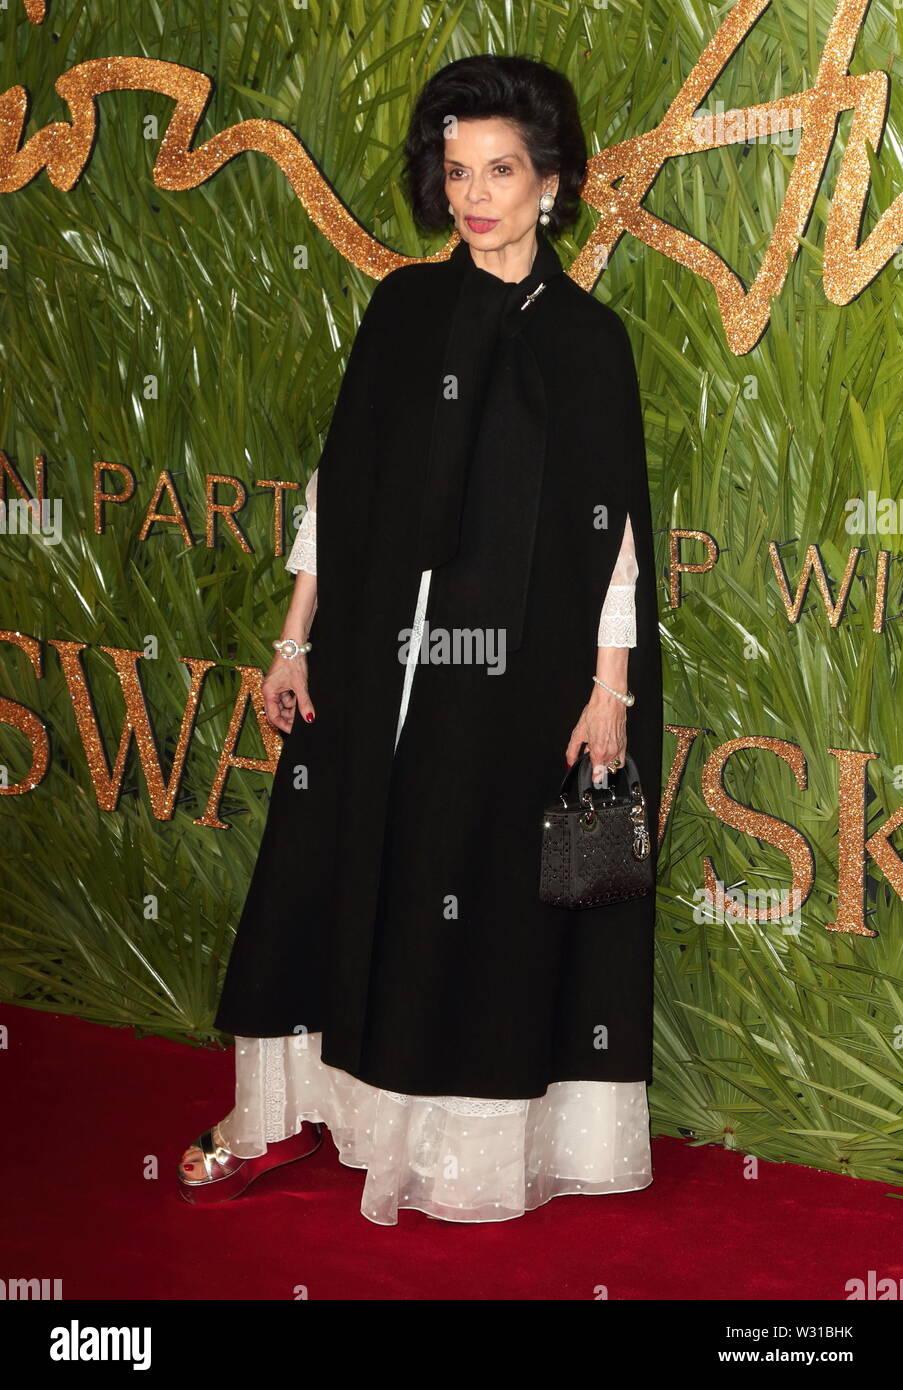 London, UK. Bianca Jagger at The Fashion Awards 2017 at the Royal Albert Hall, Kensington Gore, London on Monday 4 December 2017 Ref: LMK73-J1249-051217 Keith Mayhew/Landmark Media.  WWW.LMKMEDIA.COM. - Stock Image